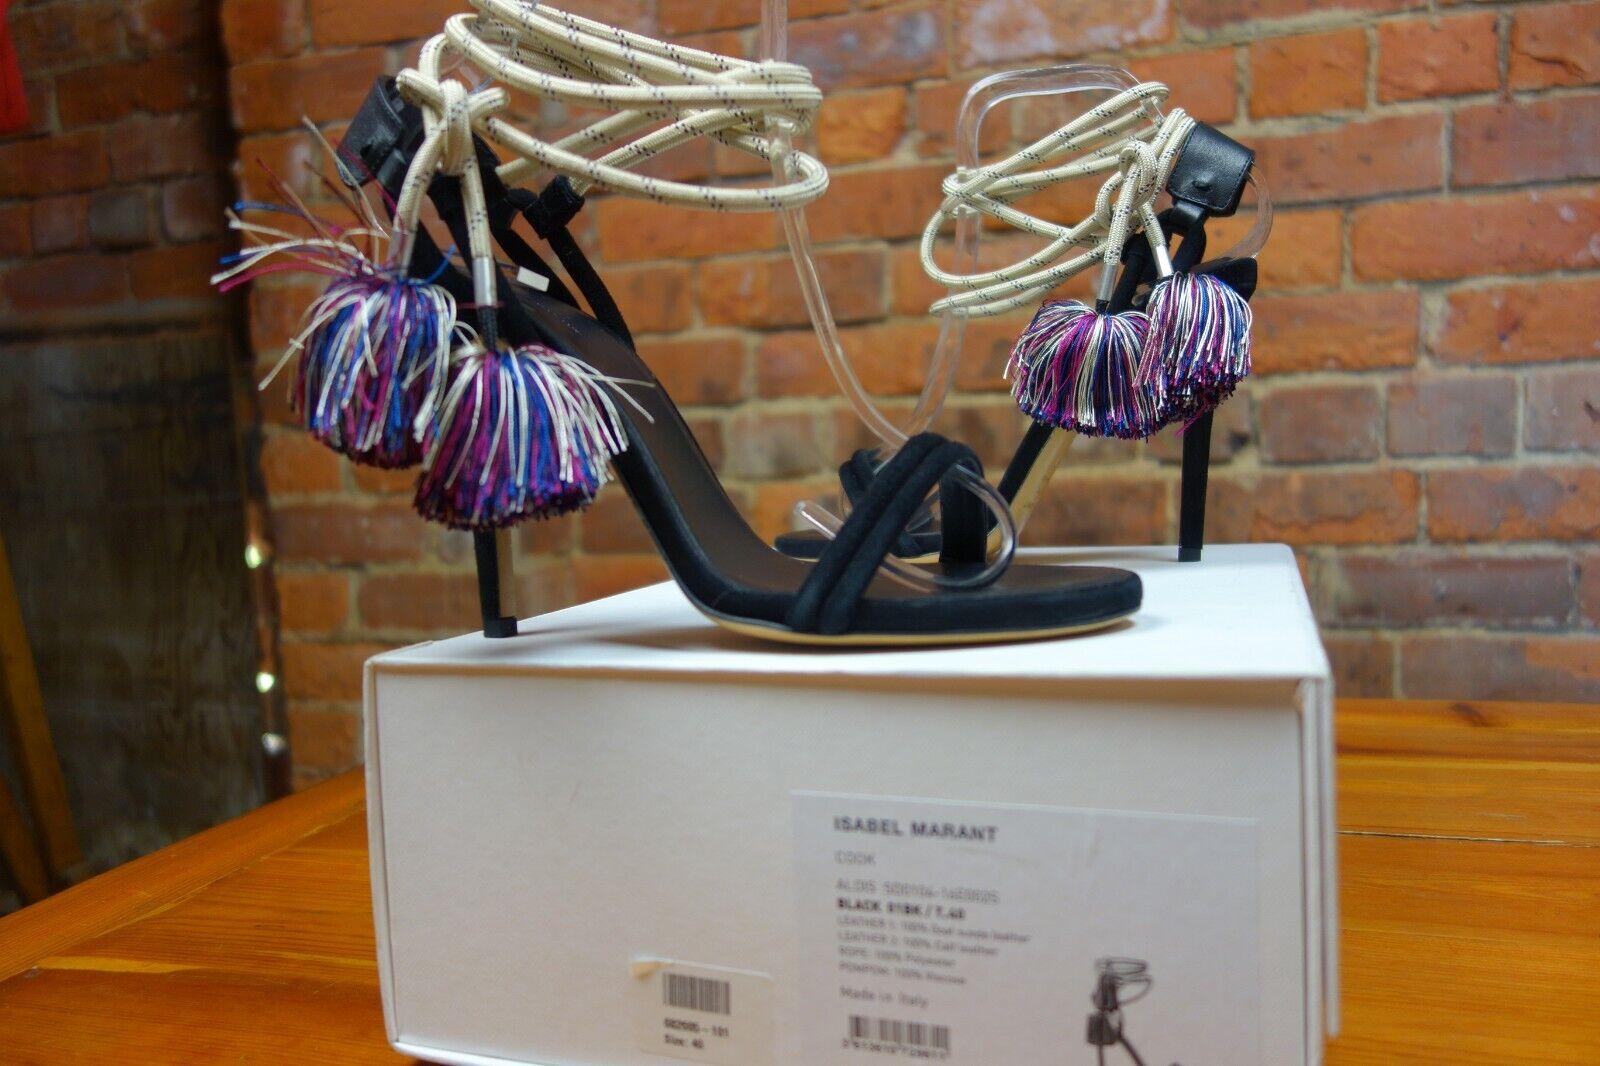 ISABEL MARANT 'Cook' Ankle-Tie Sandals. NEW   UNWORN. Original box. Cost